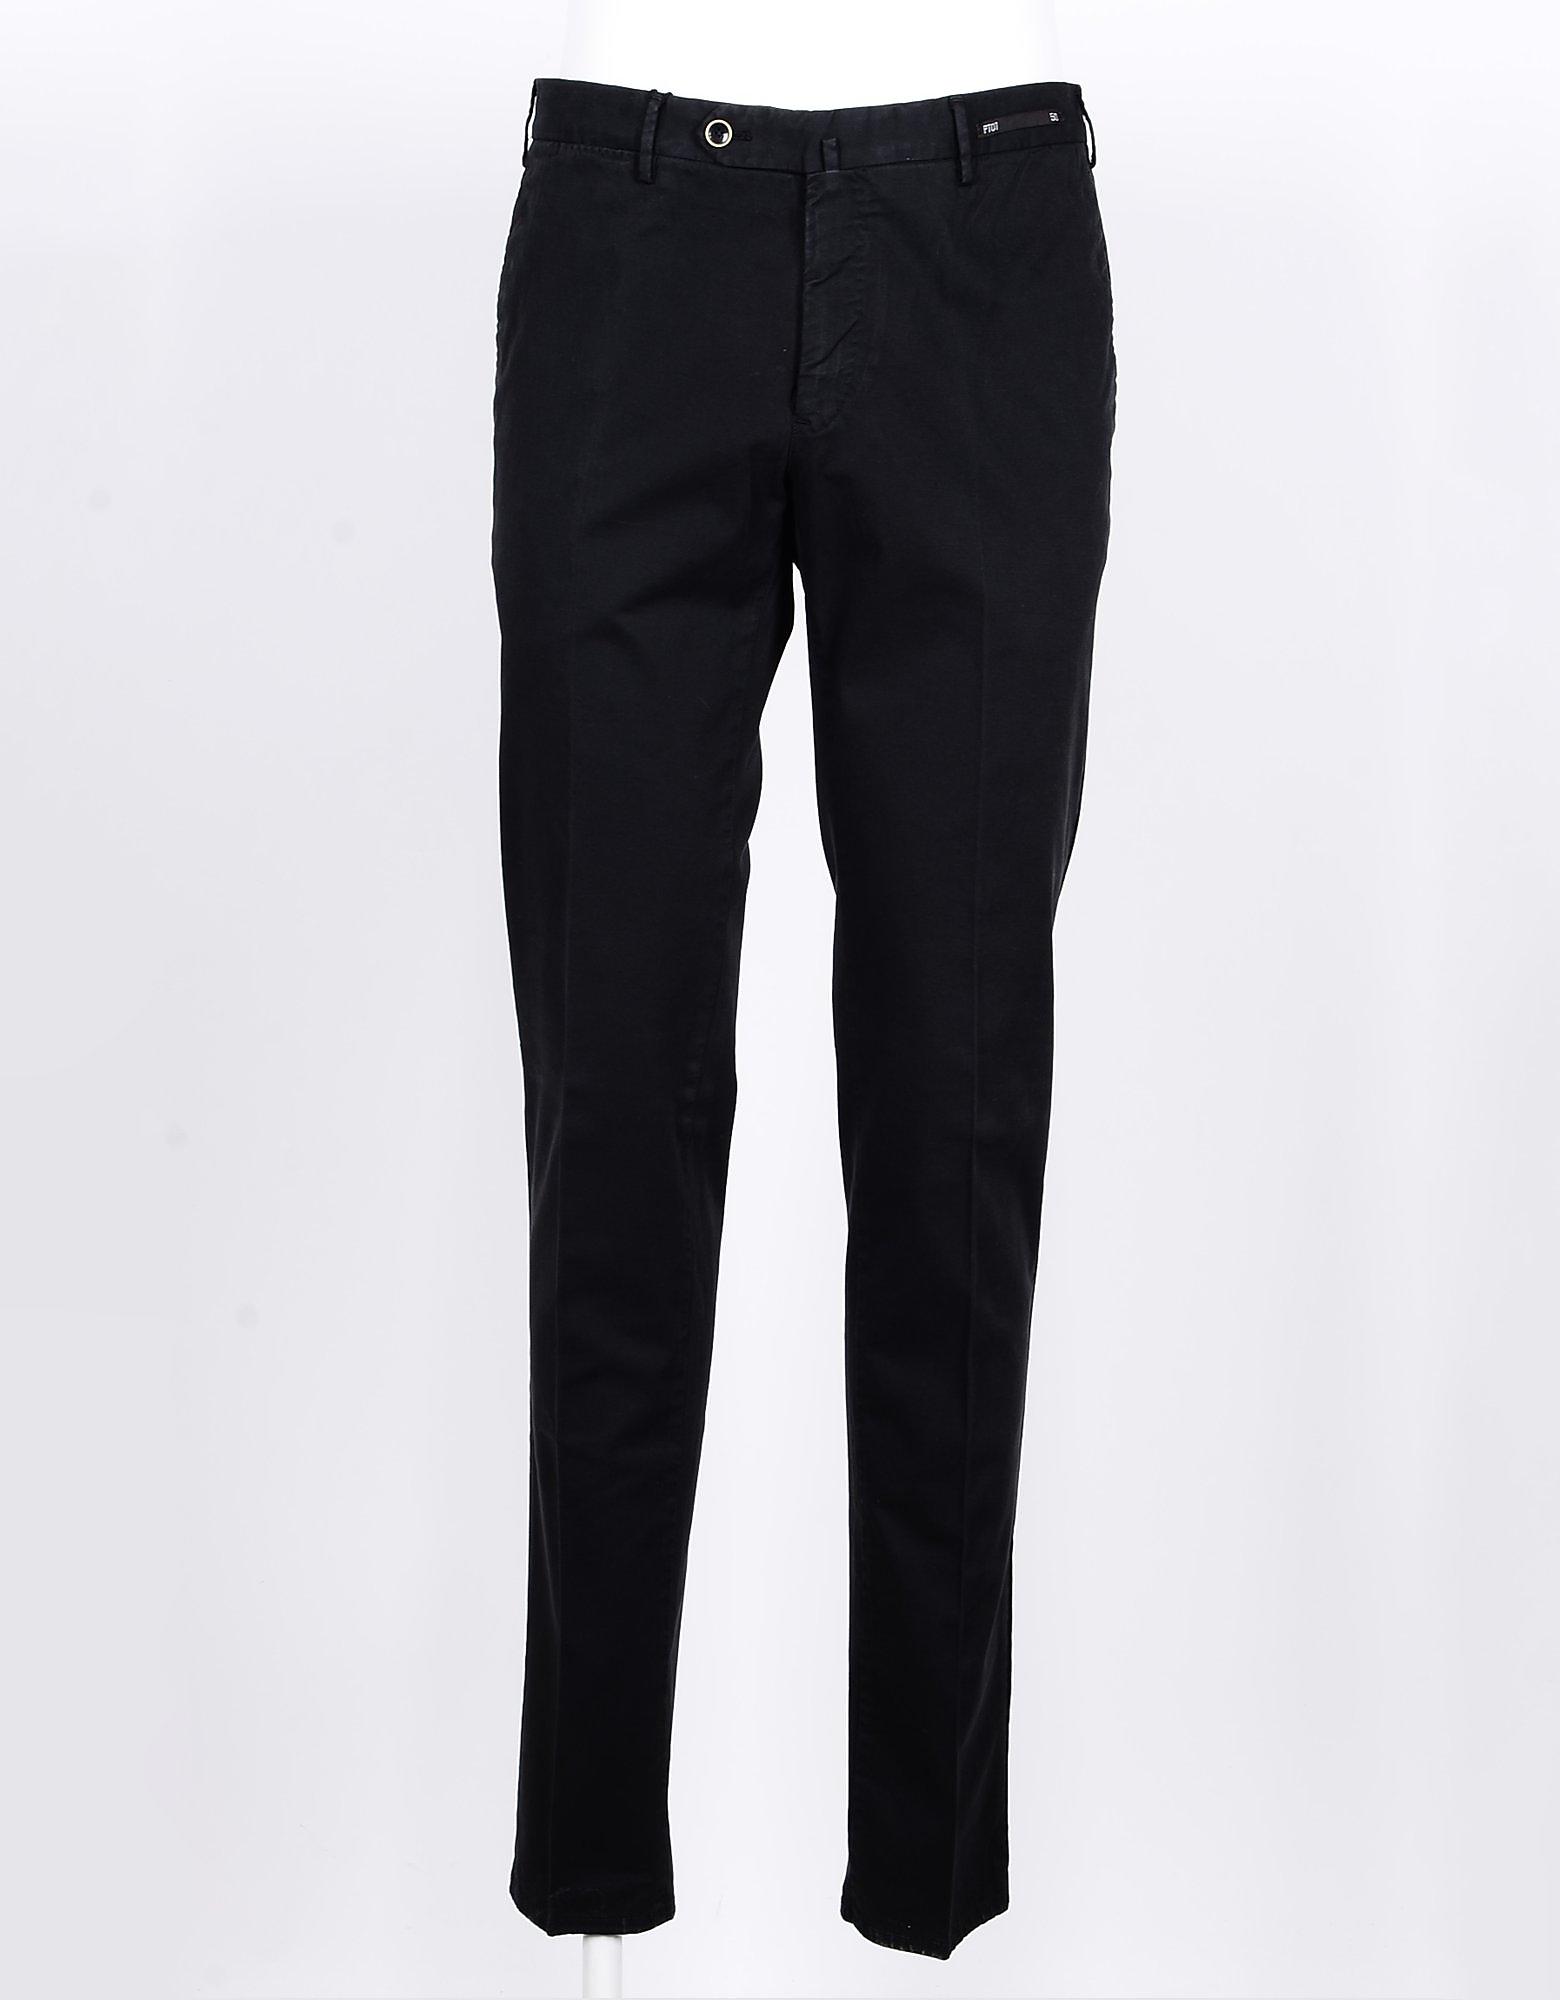 PT01 Designer Pants, Men's Black Pants